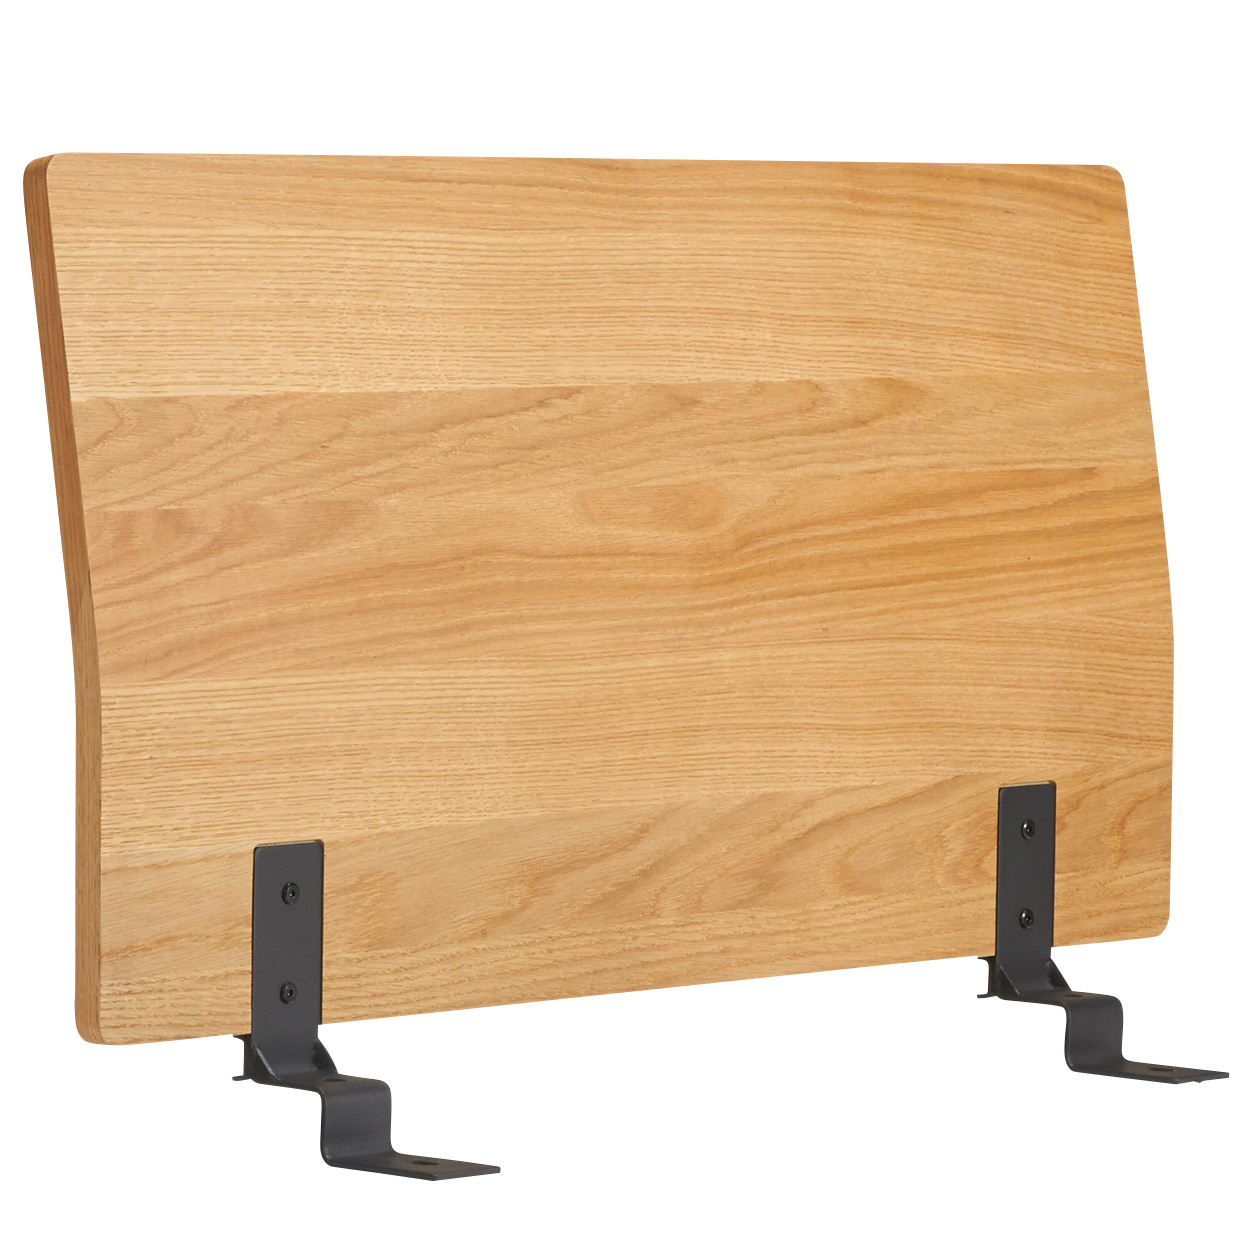 RoomClip商品情報 - ベッドフレーム用ヘッドボード・シングル・オーク材